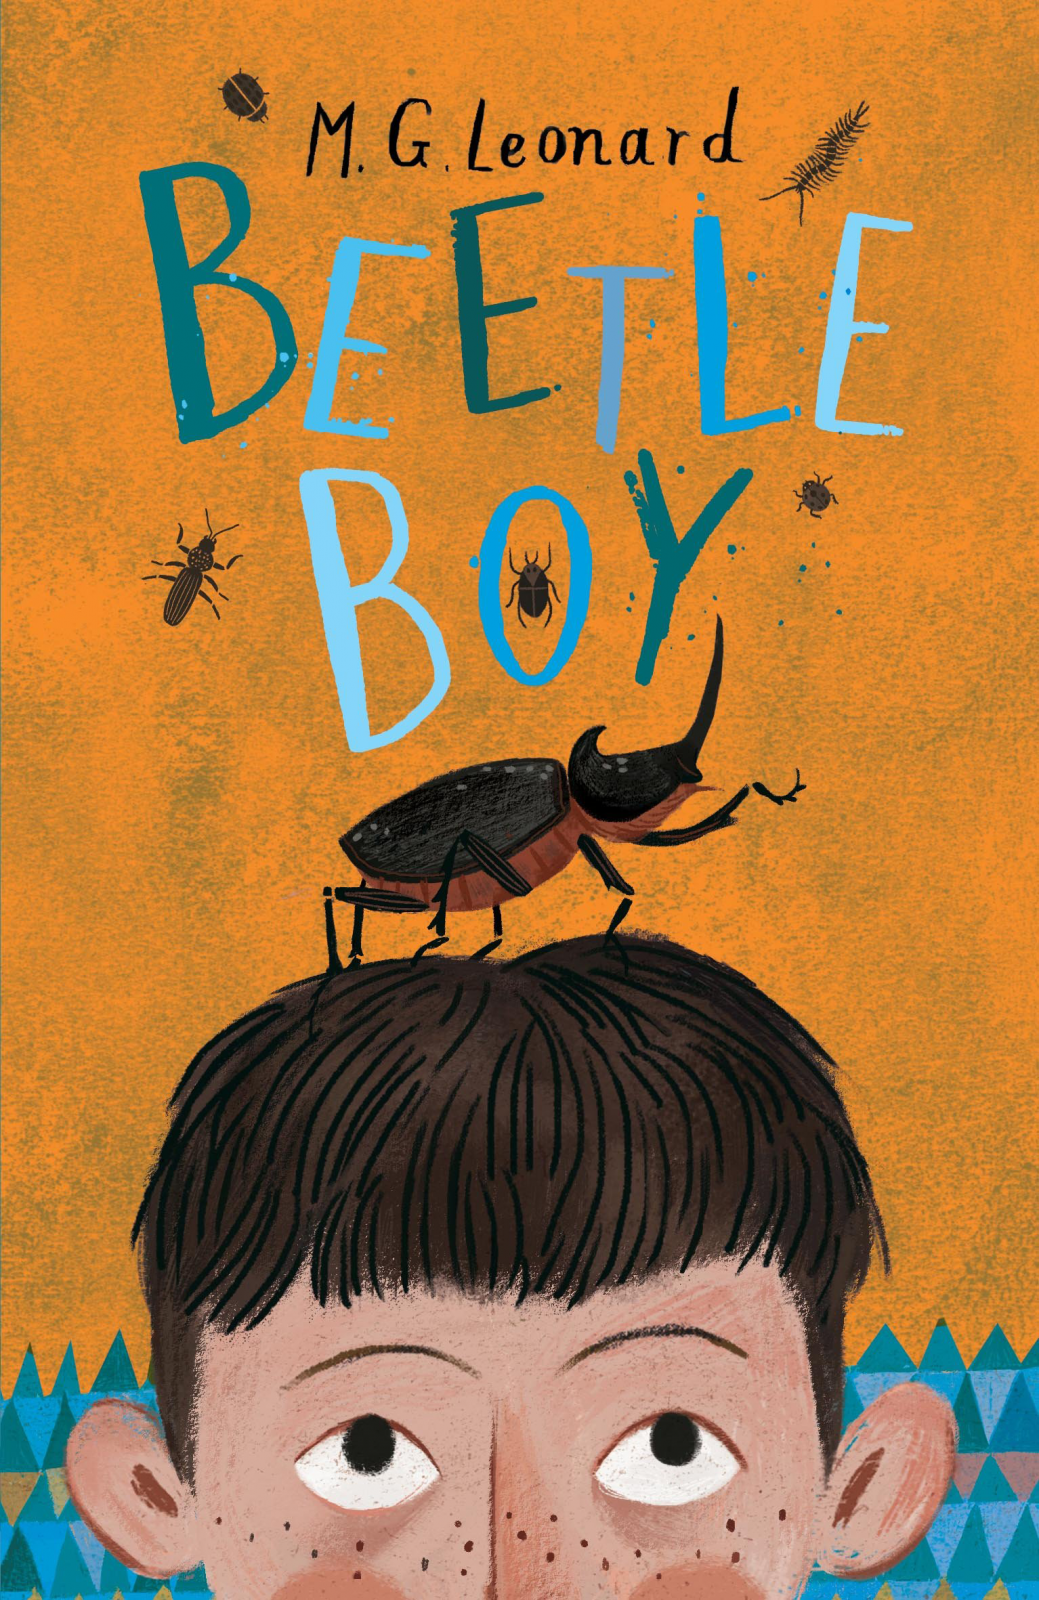 Beetle Boy My M.G. Leonard - Paperback Book